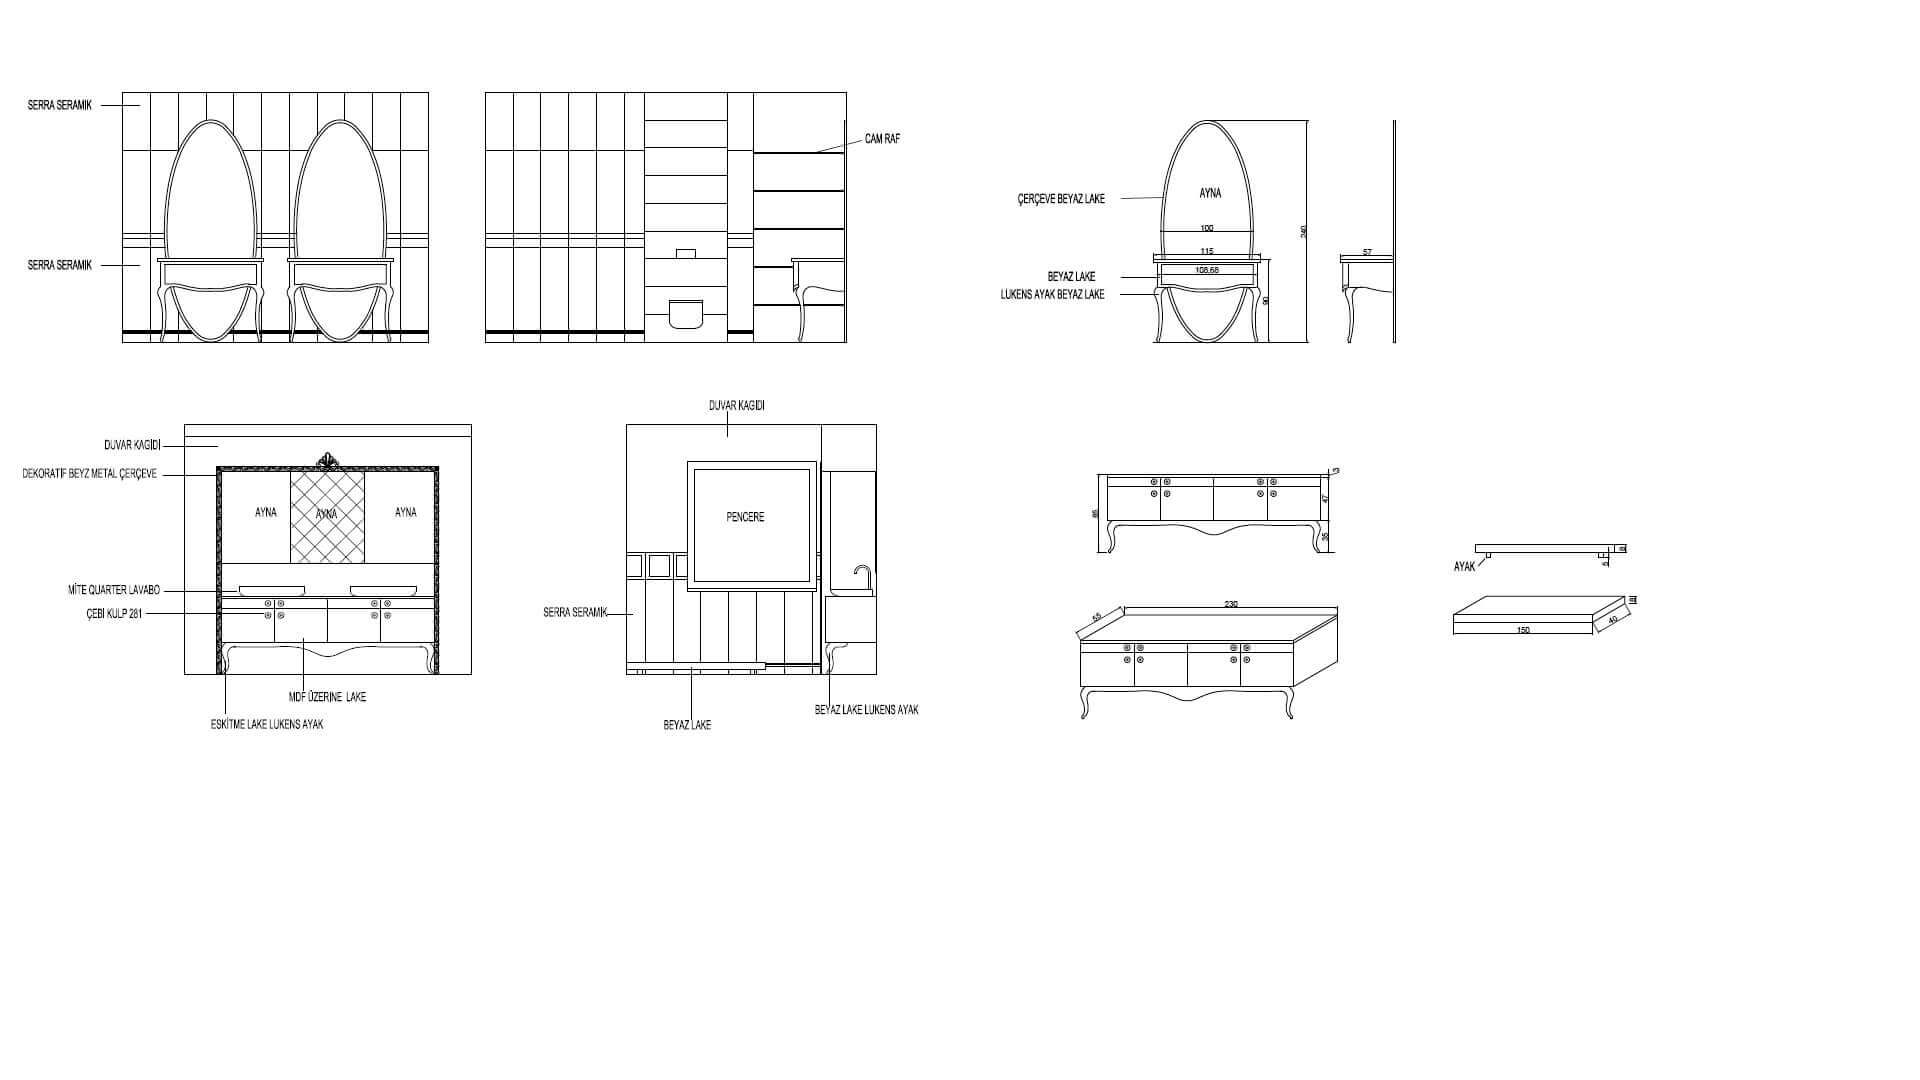 Ev iç tasarım 2911 C. Balta Konutu Konutlar